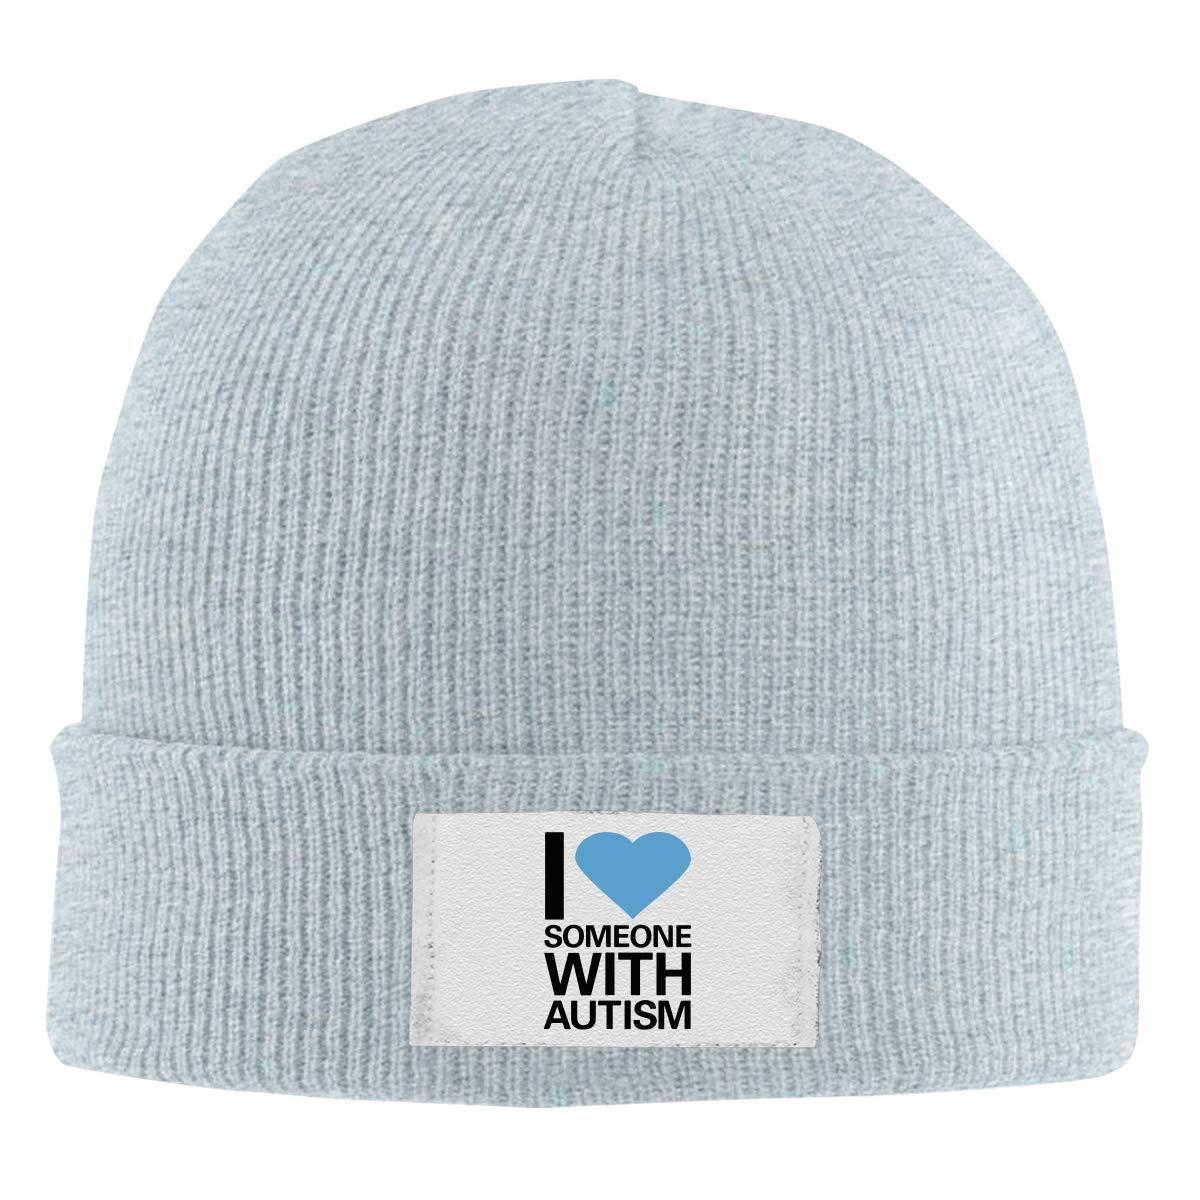 Bike Heartbeat Women and Men Skull Caps Winter Warm Stretchy Knit Beanie Hats